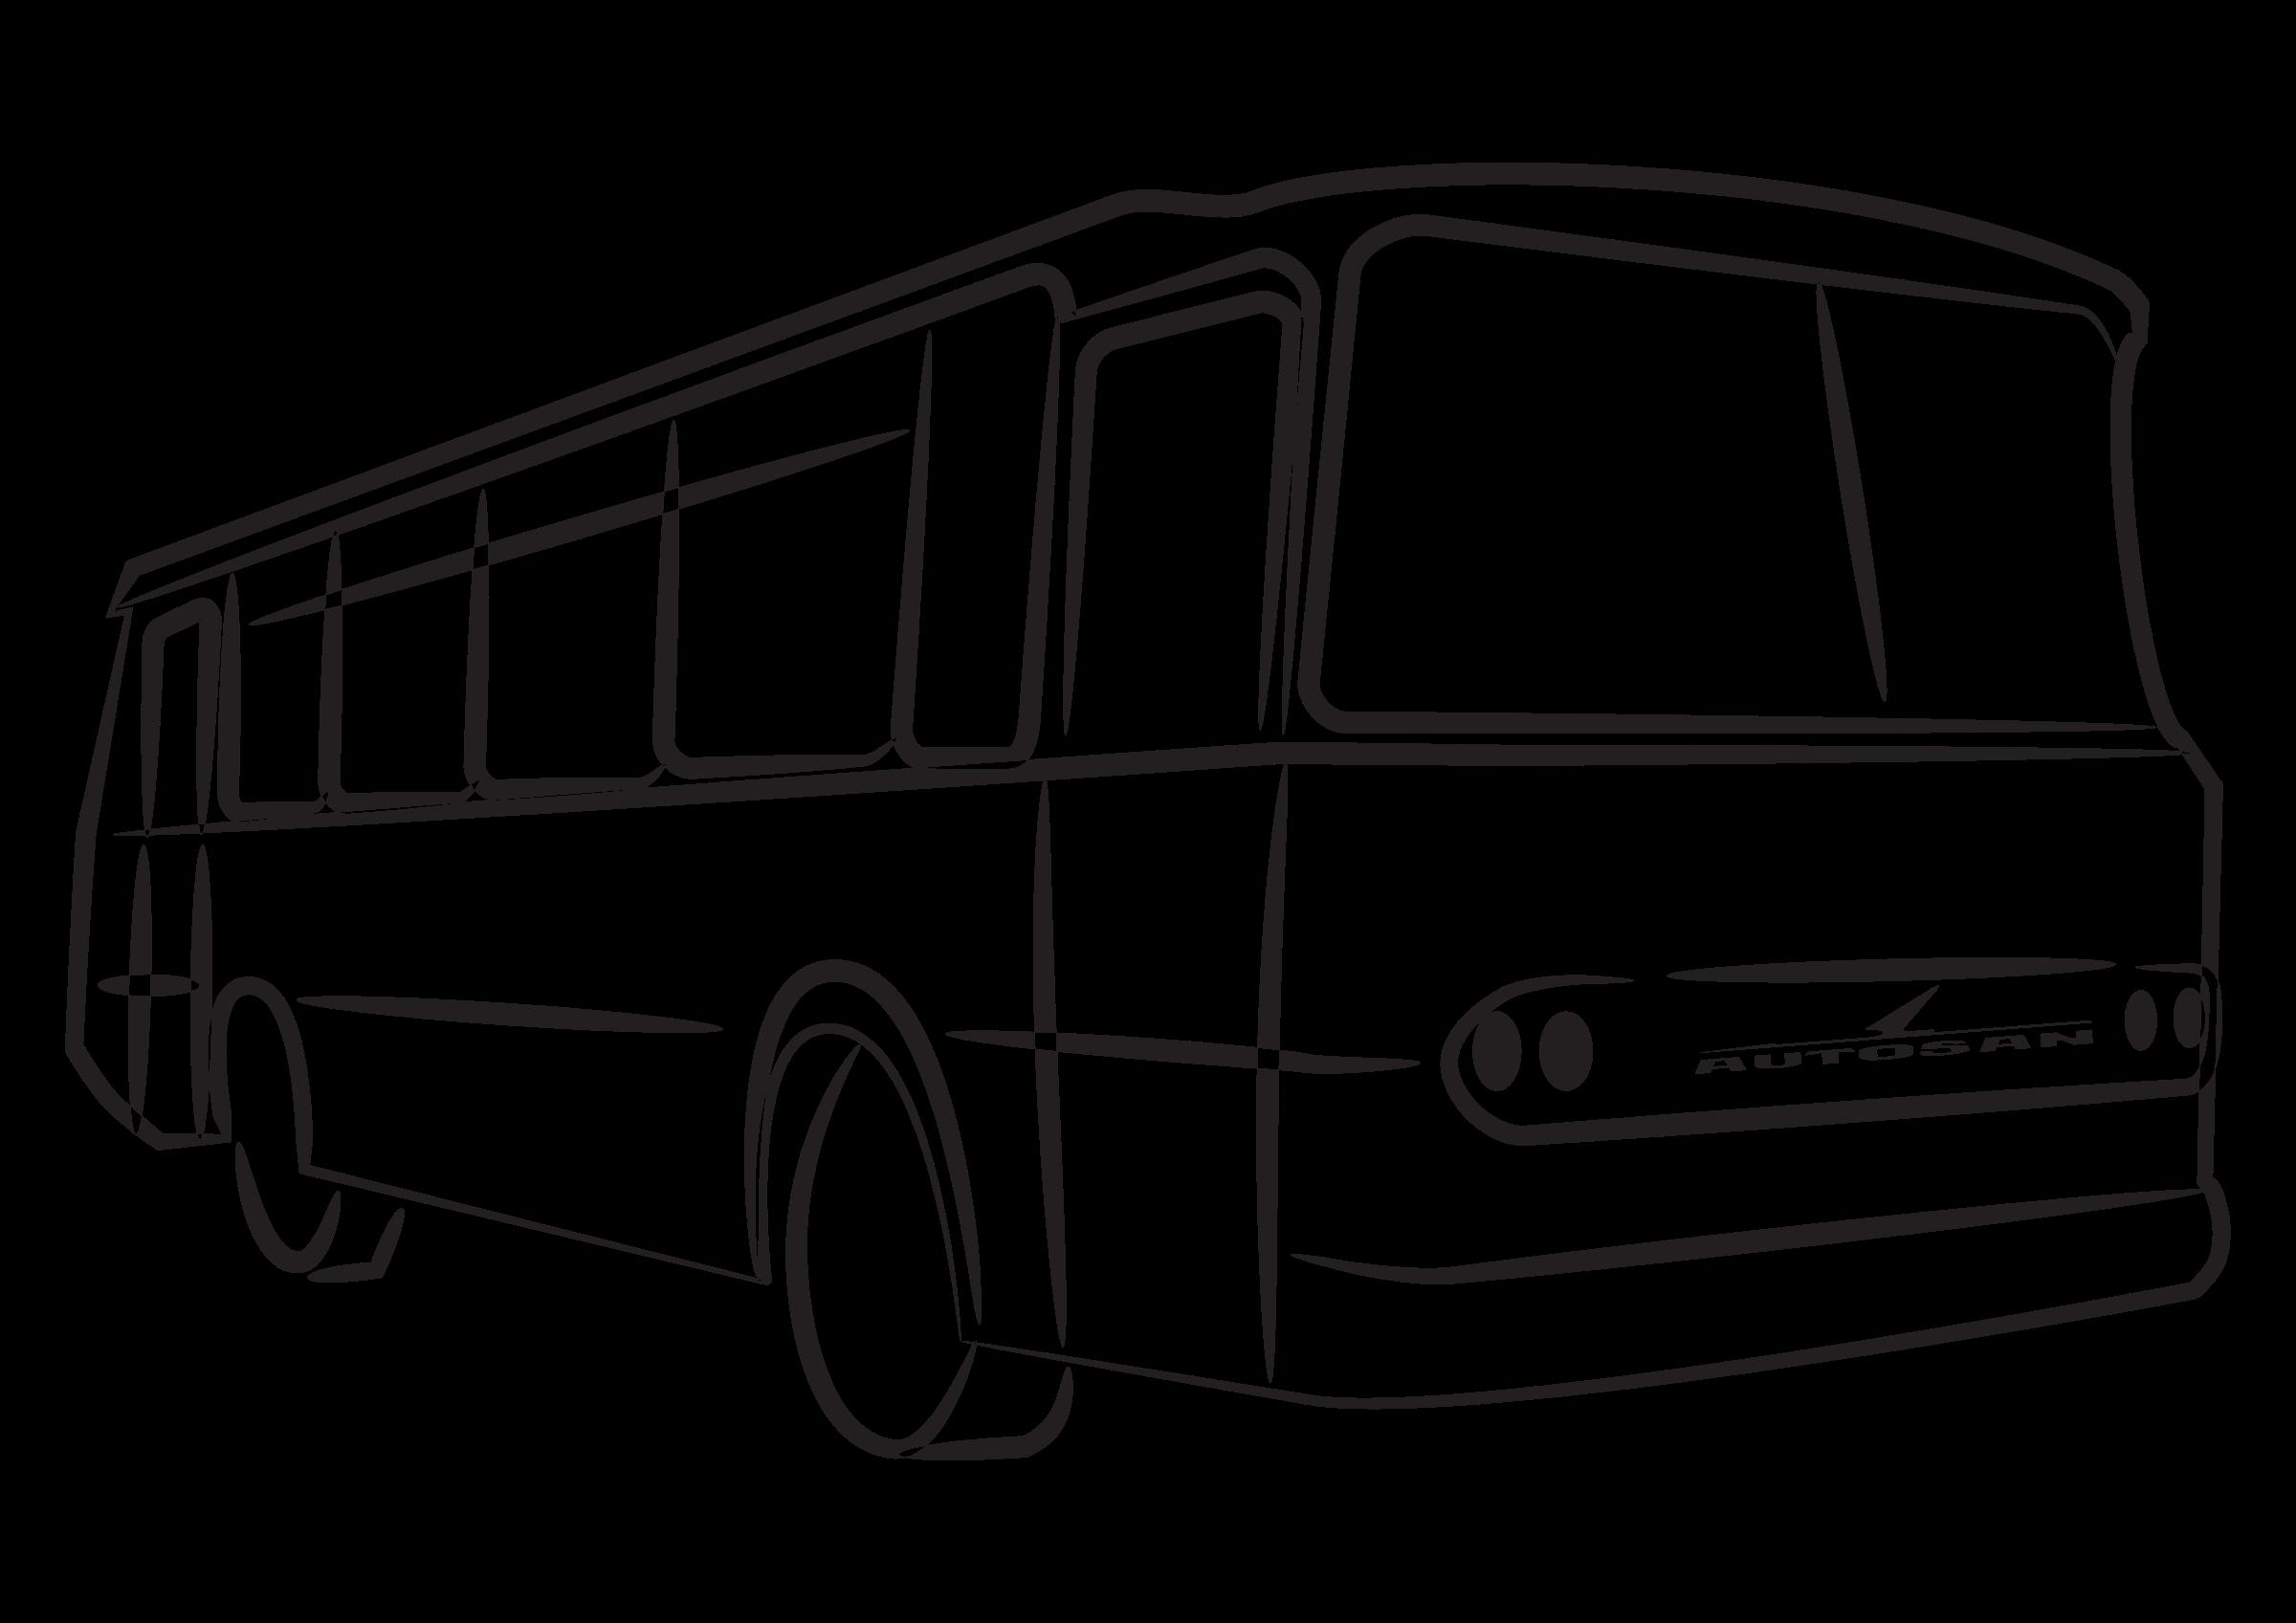 Sylwetka autosan h x. Coloring clipart bus